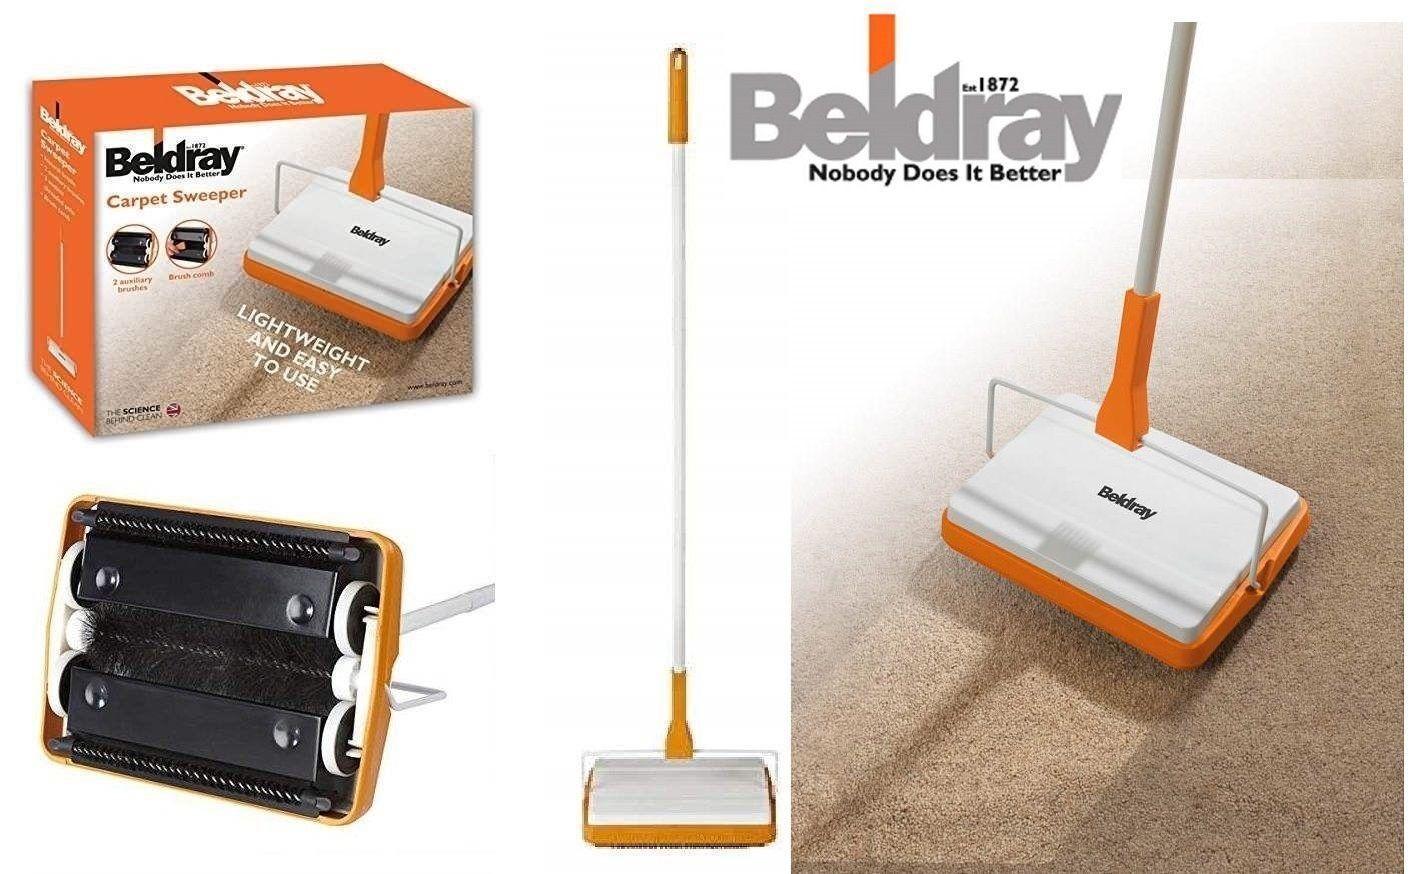 Beldray Manual Carpet Sweeper 3 Brush Cordless Hard Floor Rug Cleaner Duster New